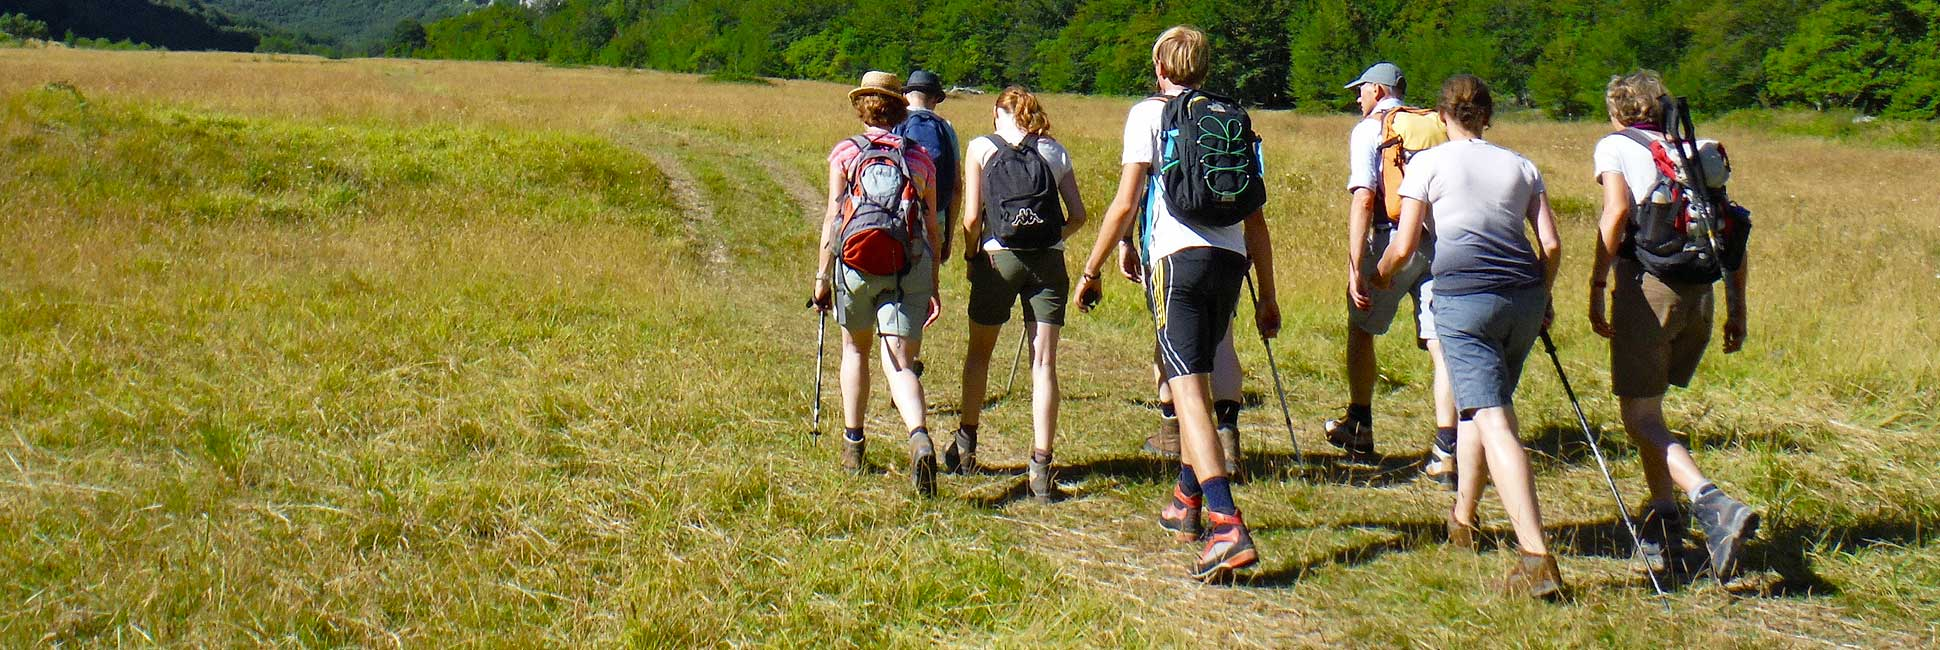 wandelcoaching-1-Sviluppa-Training,-Coaching-en-Persoonlijke-Ontwikkeling